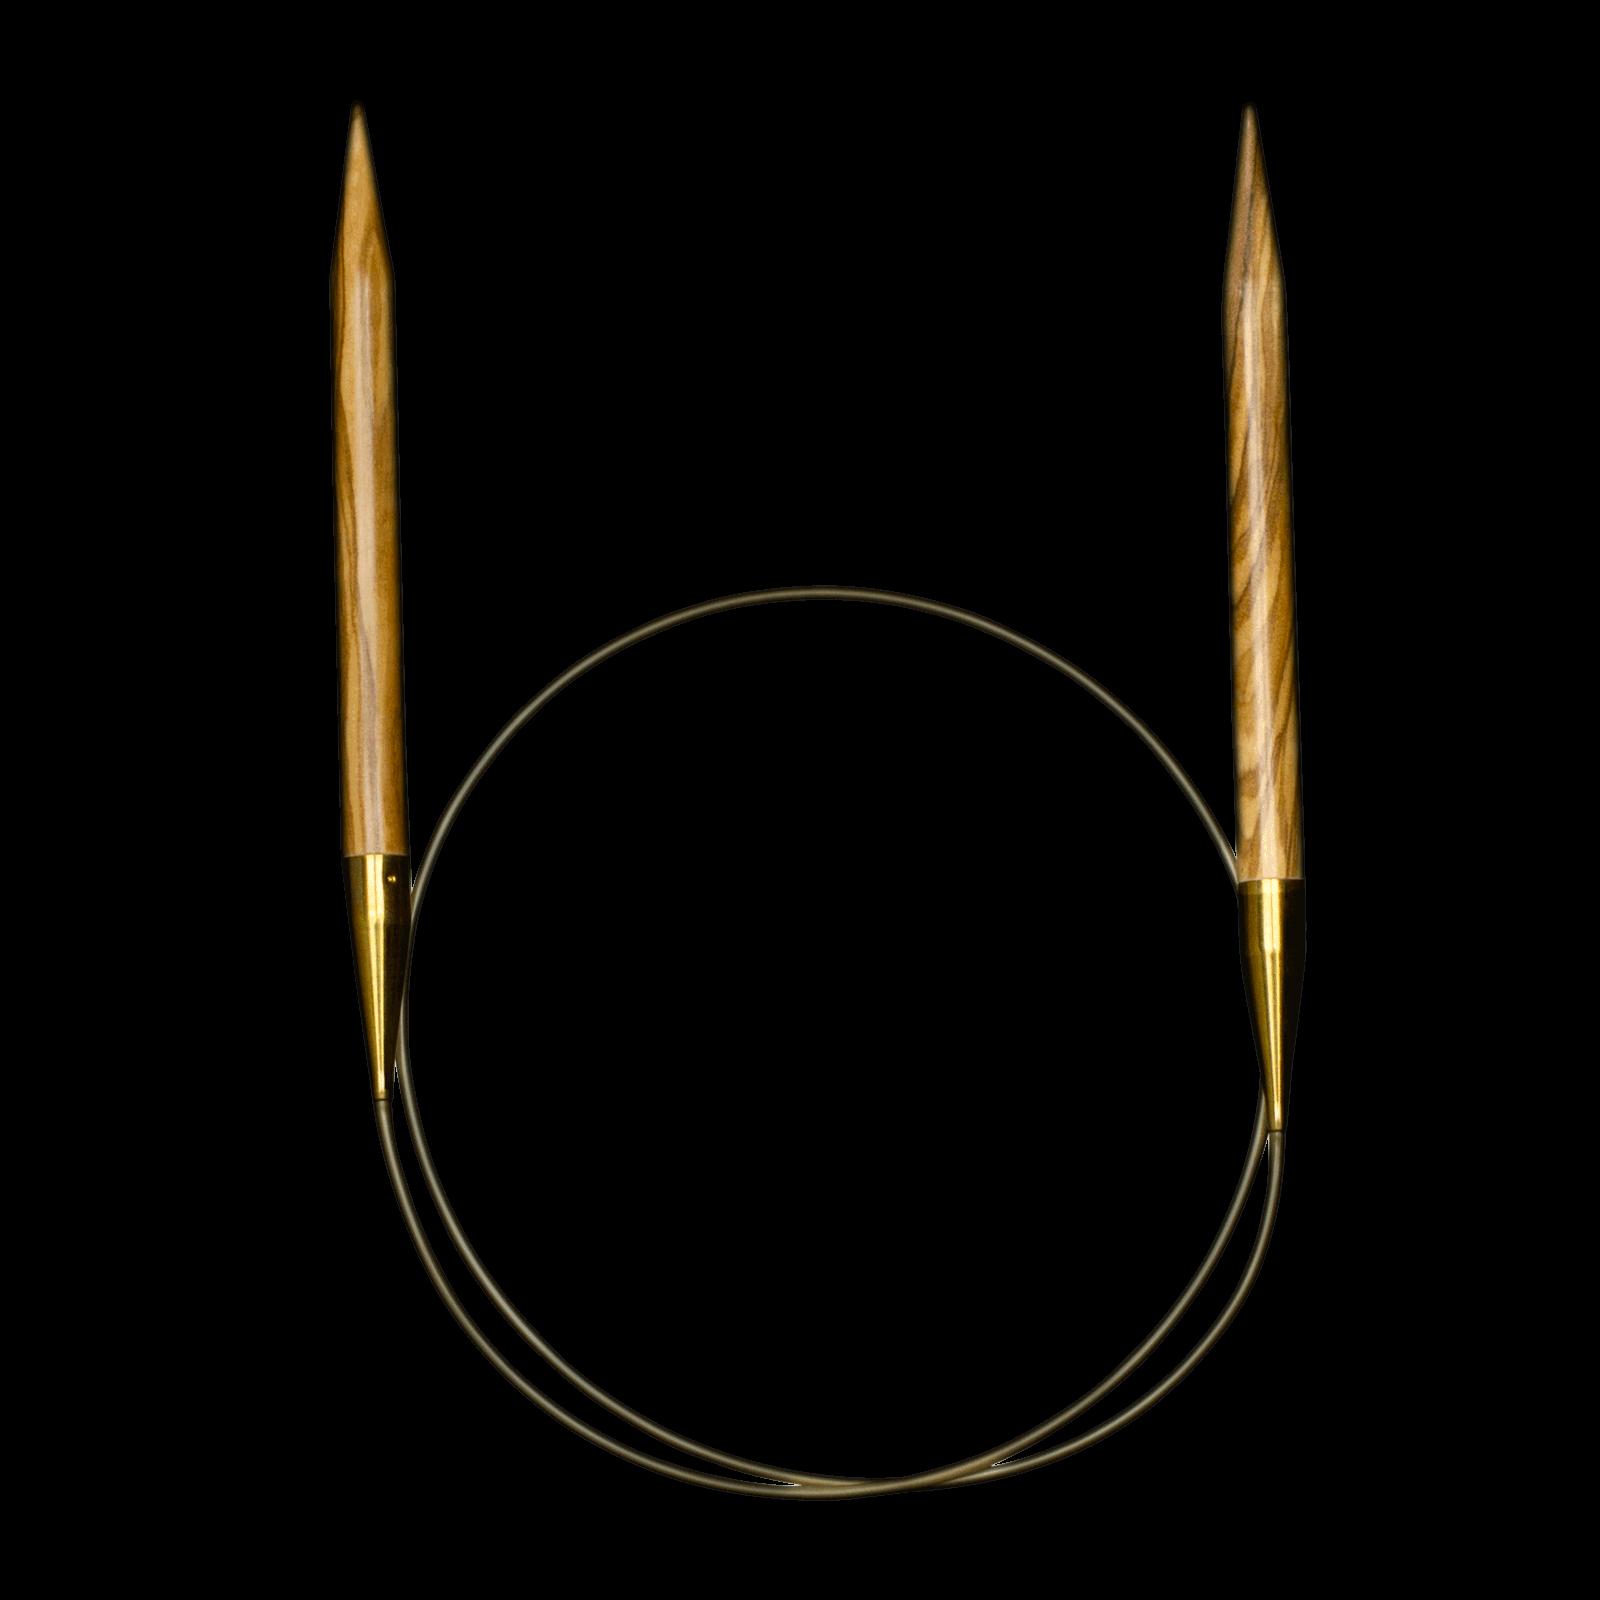 575 7 olivewood circular needle